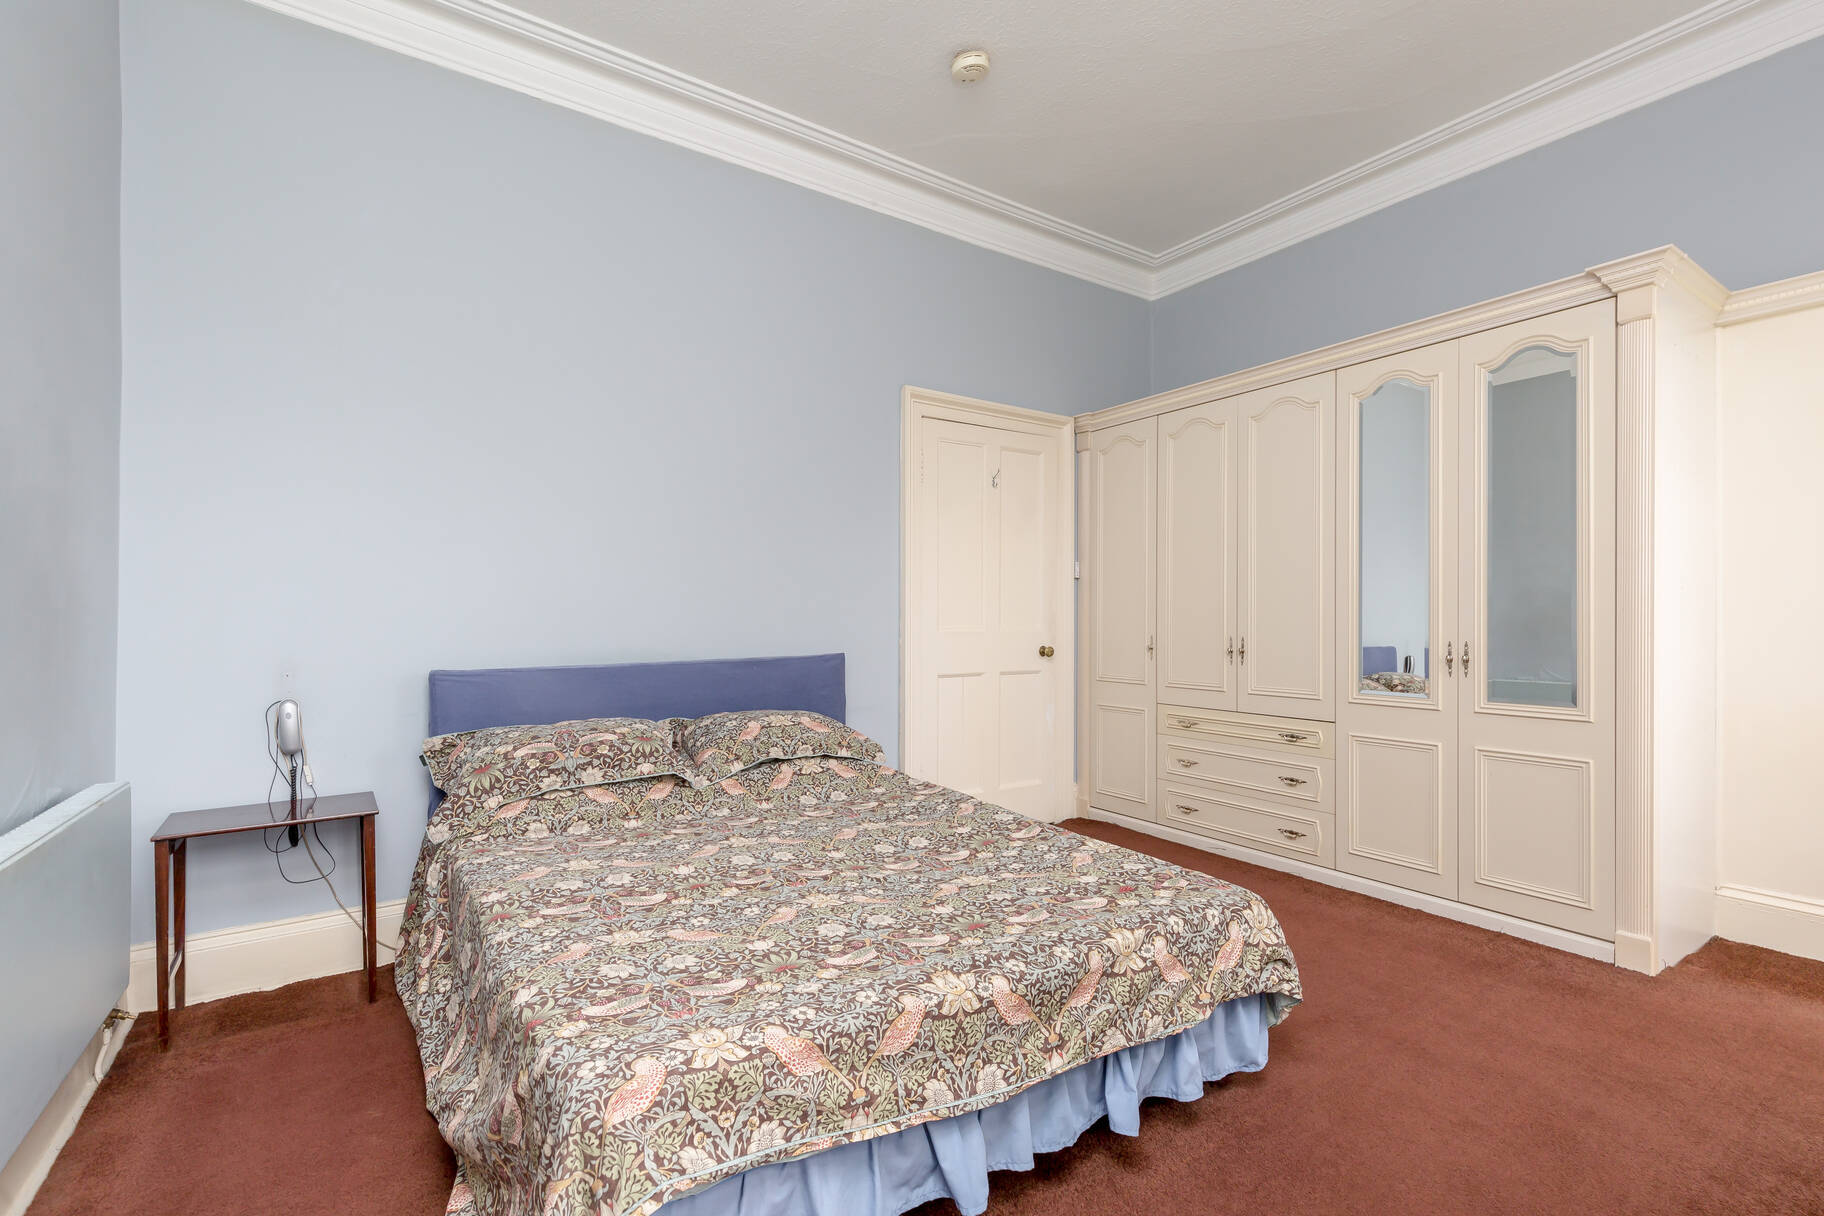 51 Mount Vernon Road, Edinburgh, EH16 6JG